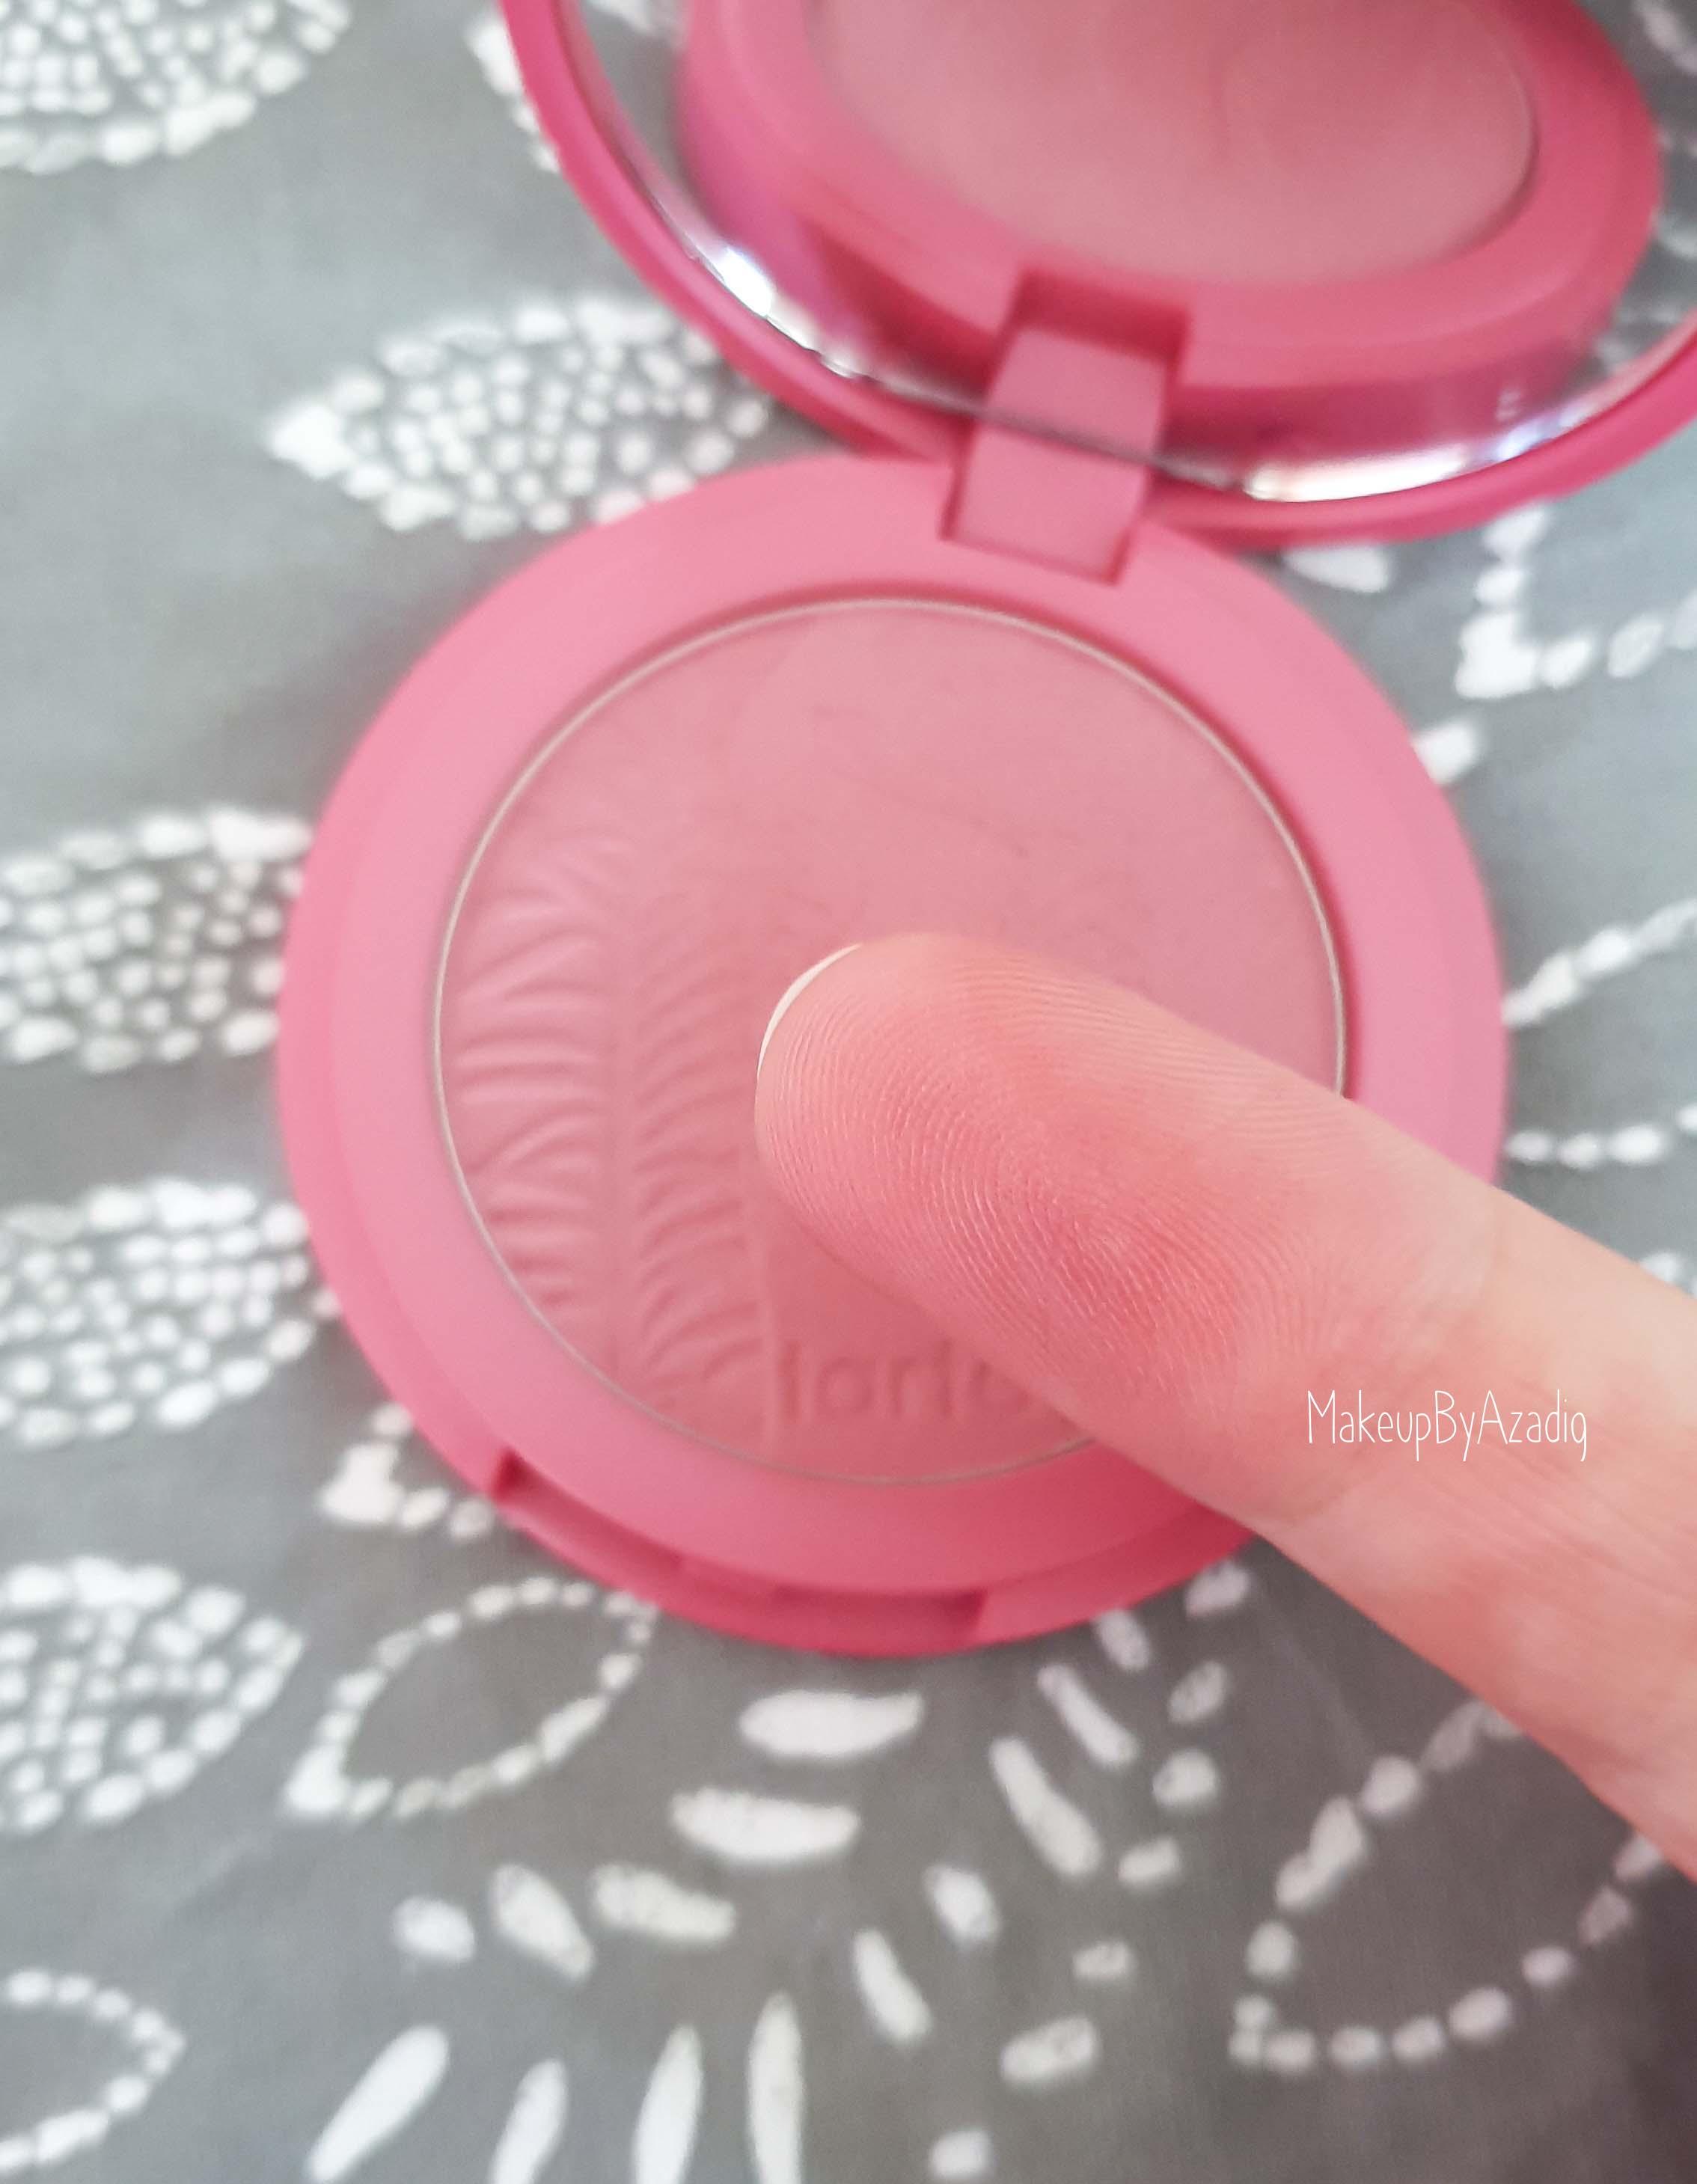 revue-blush-amazonian-clay-tarte-cosmetics-makeupbyazadig-sephora-france-blushing-bride-avis-prix-swatches